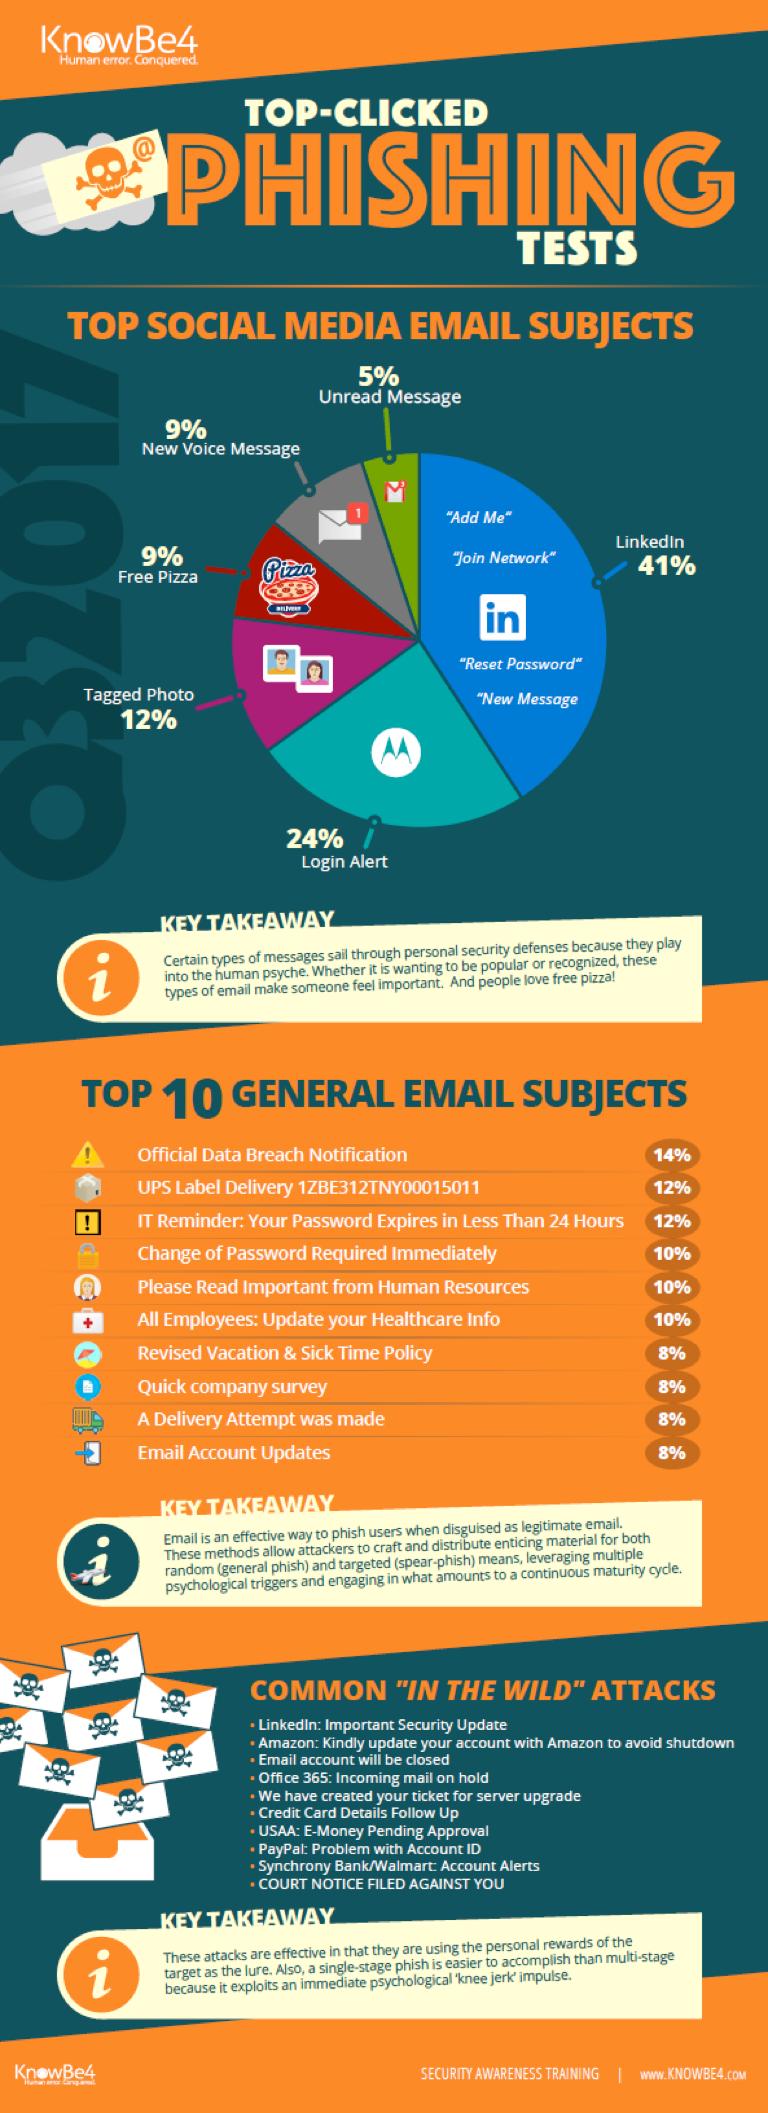 Q3-2017-Phishing-Email-Subjects-Infographic